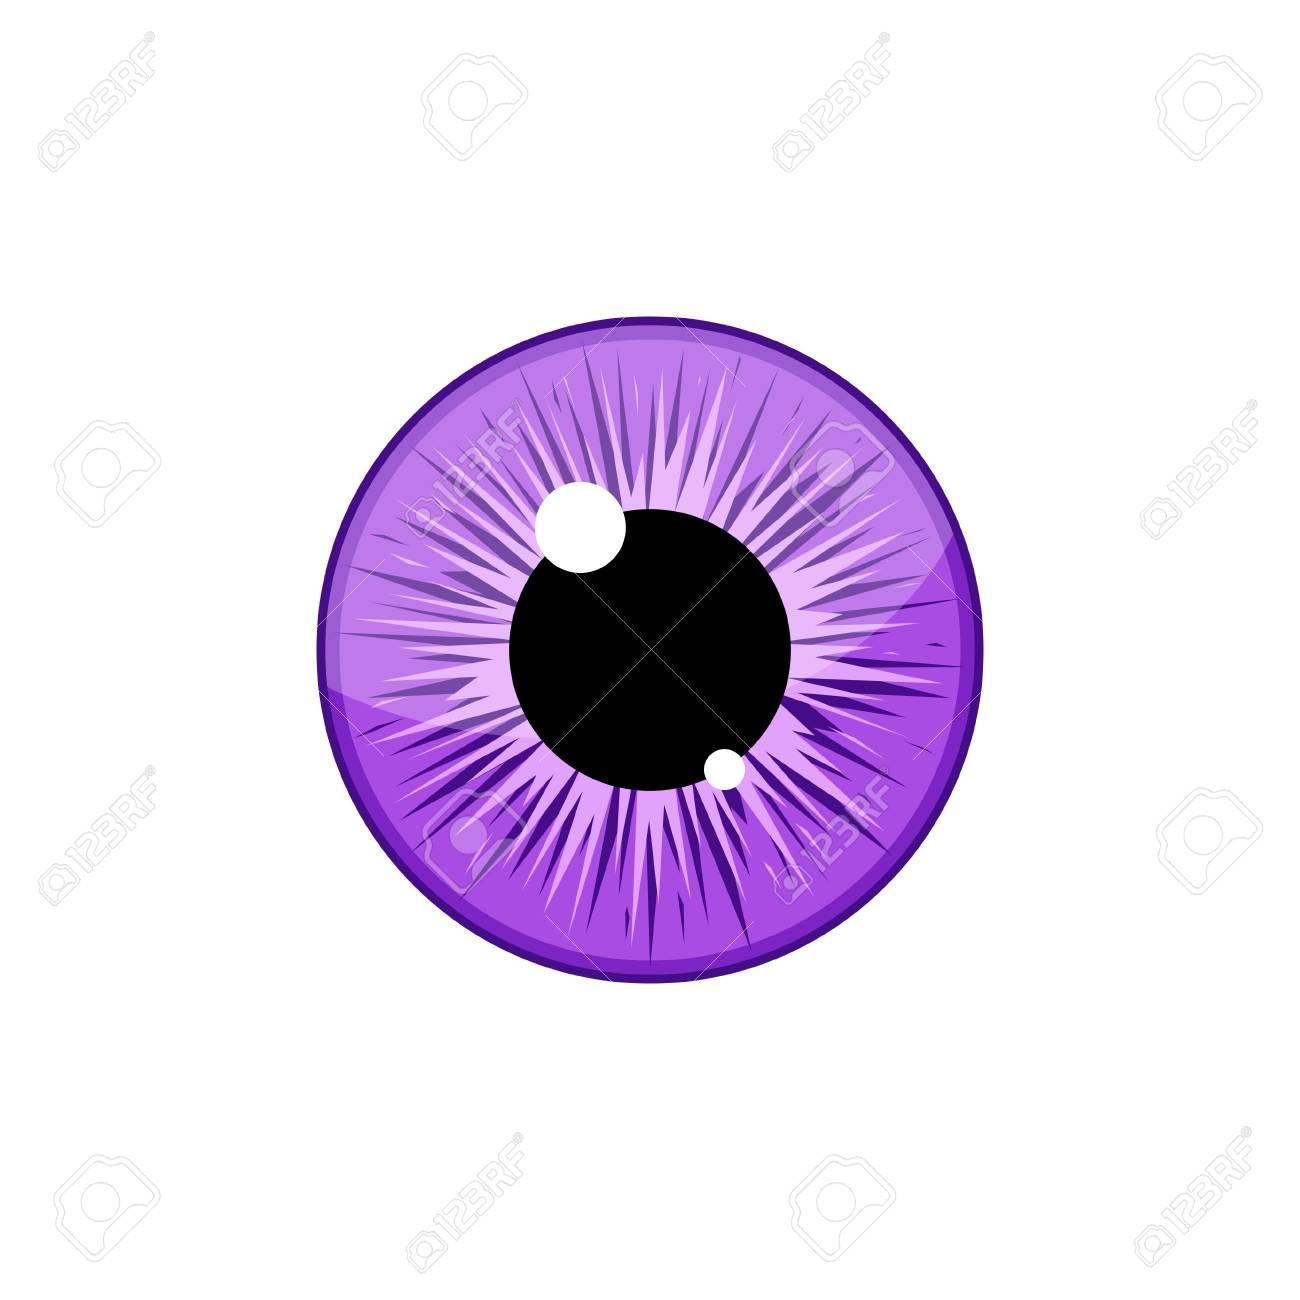 human violet eyeball iris pupil isolated on white background